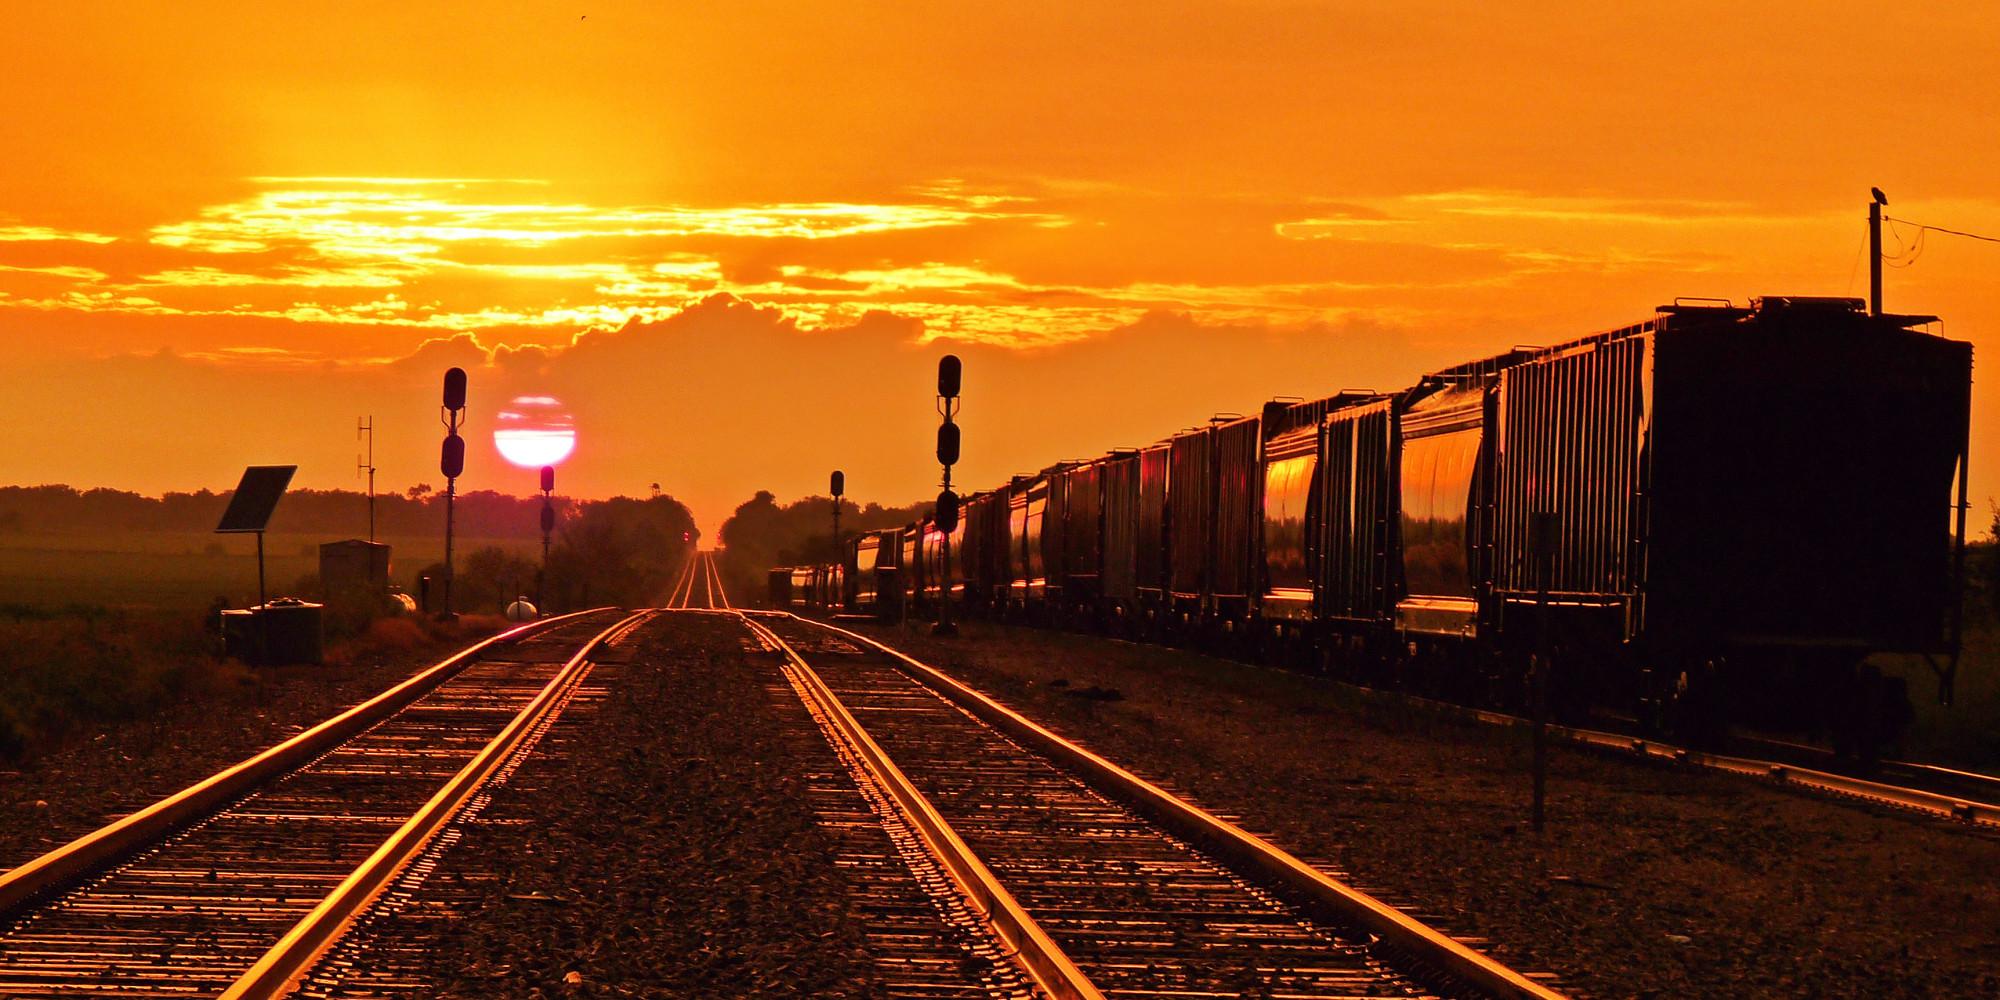 news climate change warp railroad tracks sun kinks